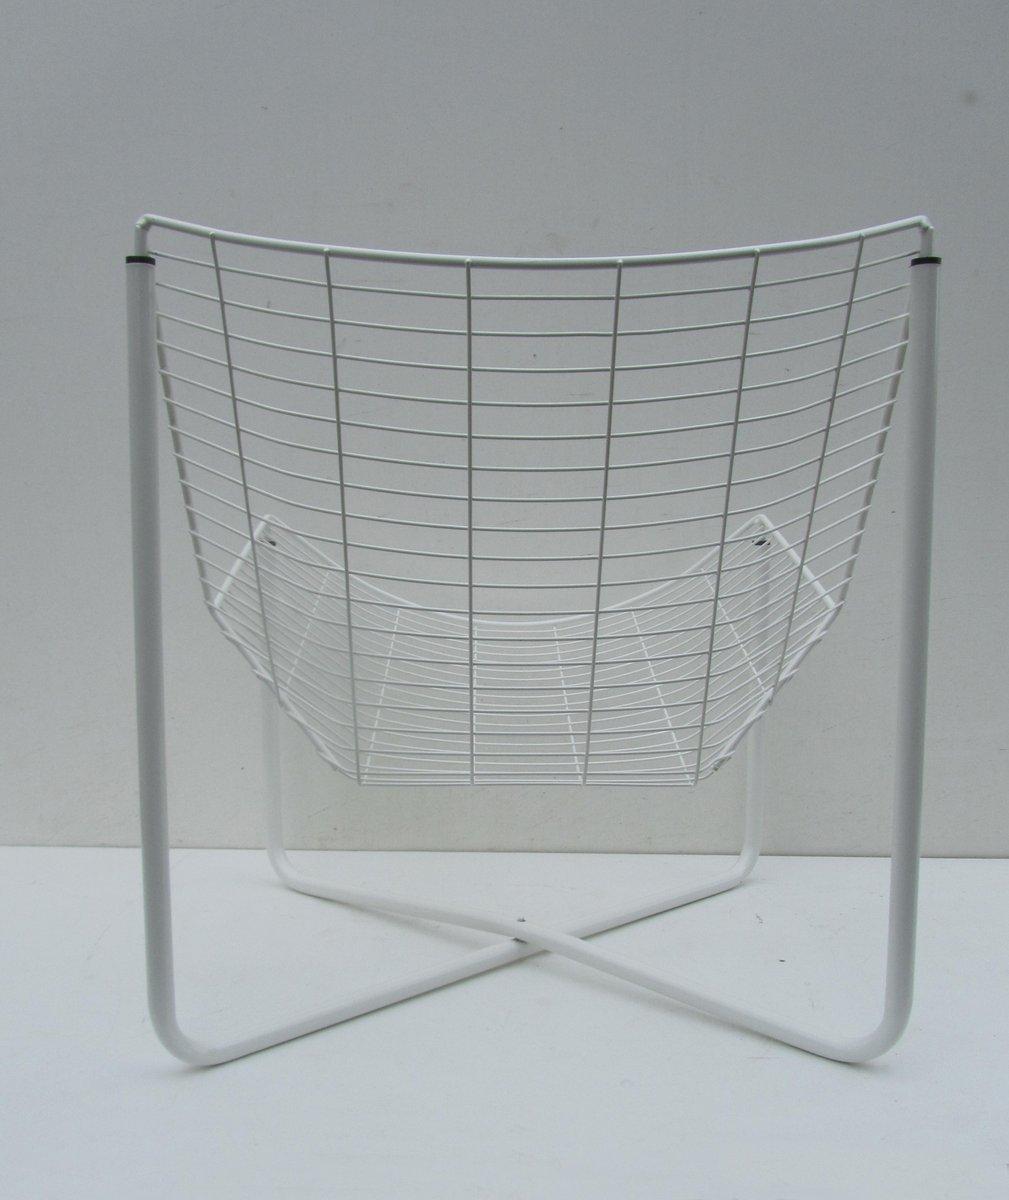 Sedia a rete jarpen bianca di niels gammelgaard per ikea for Ikea sedia a dondolo bianca